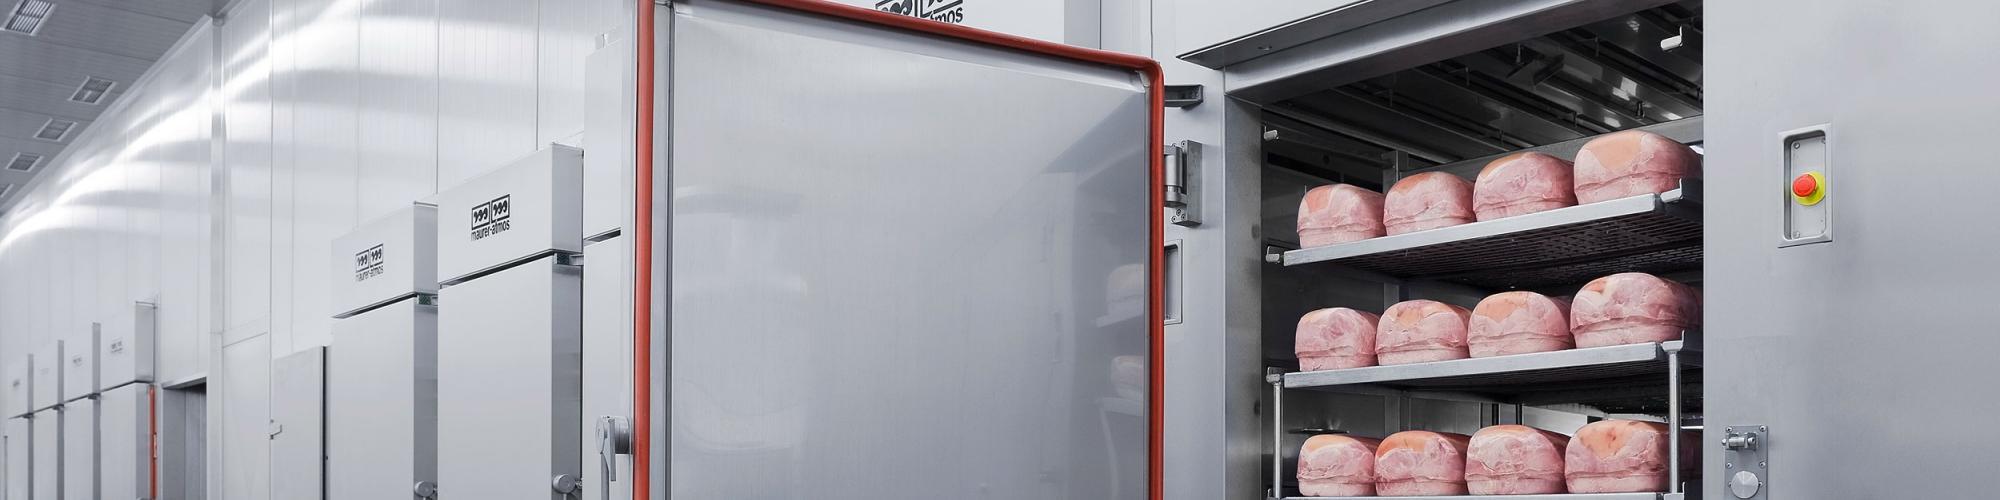 Maurer-Atmos Middleby GmbH